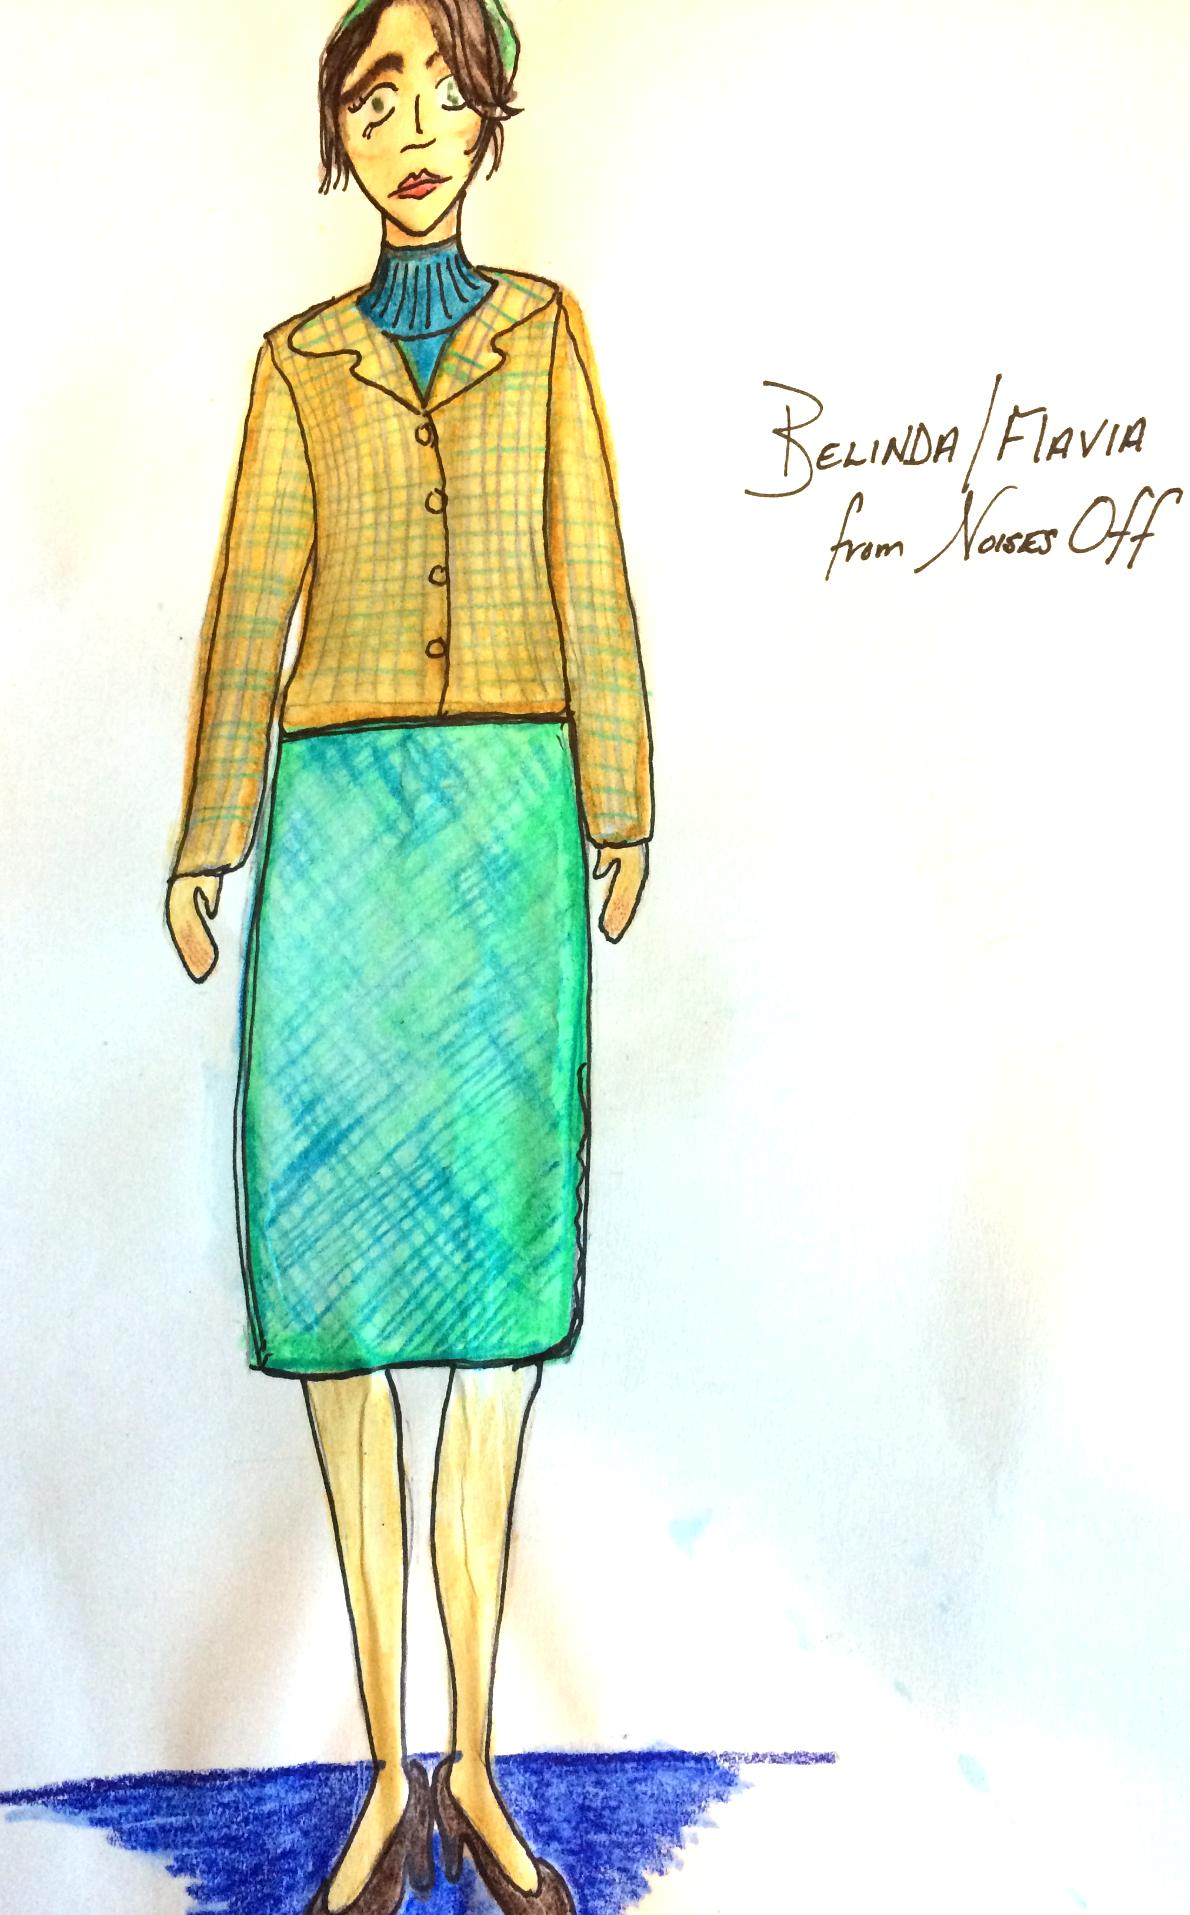 Belinda/Flavia